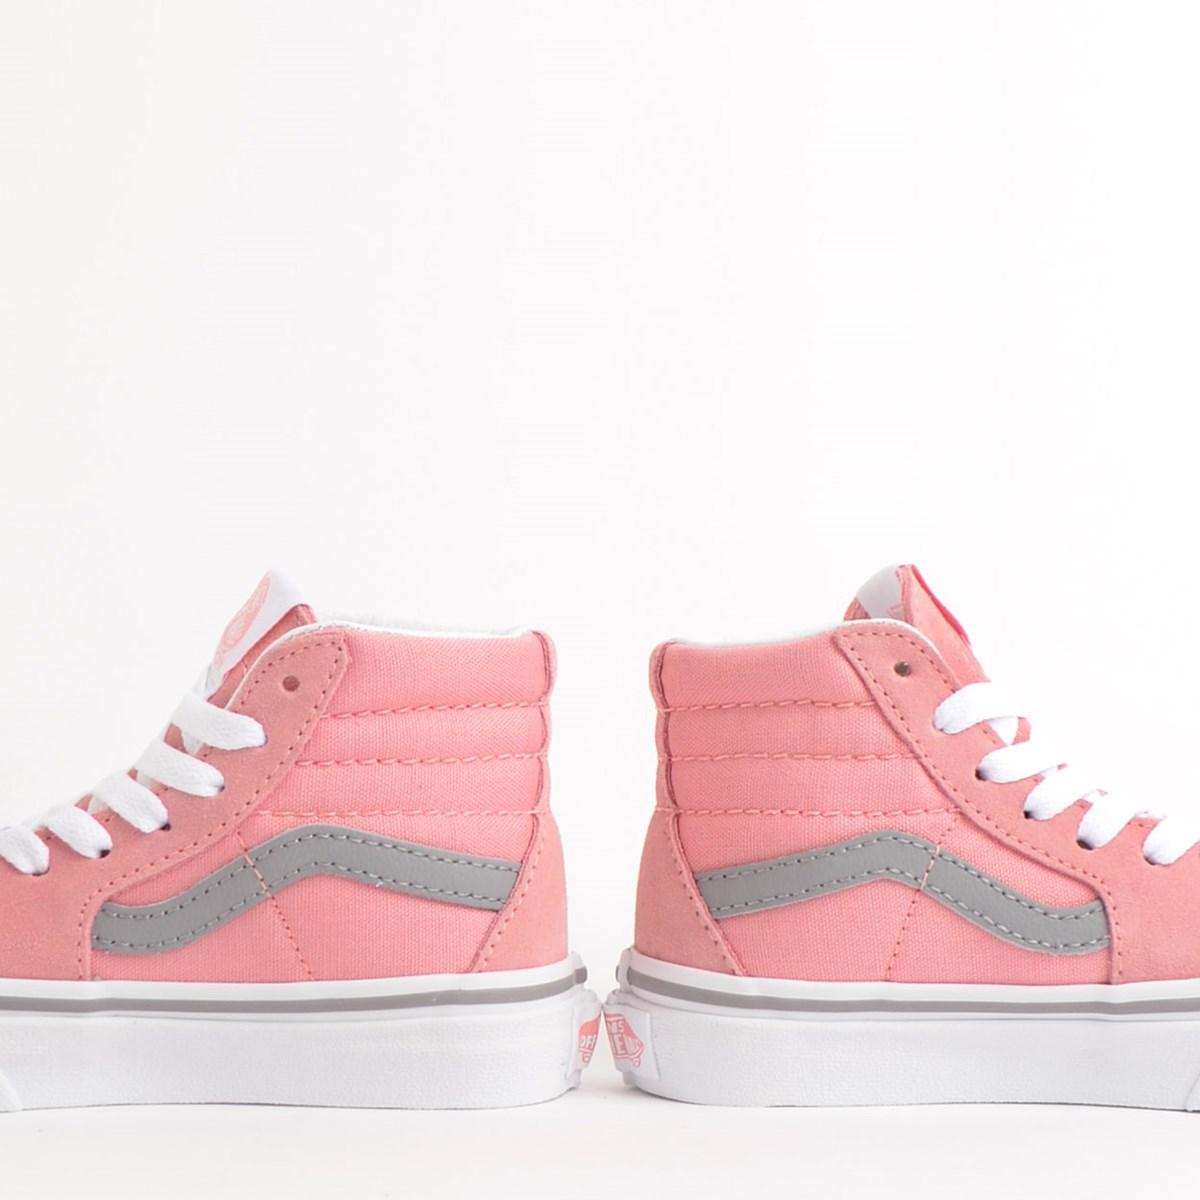 Tênis Vans Kids Sk8 Hi Pop Pink Icing Frost Gray VN0A4BUWXWE